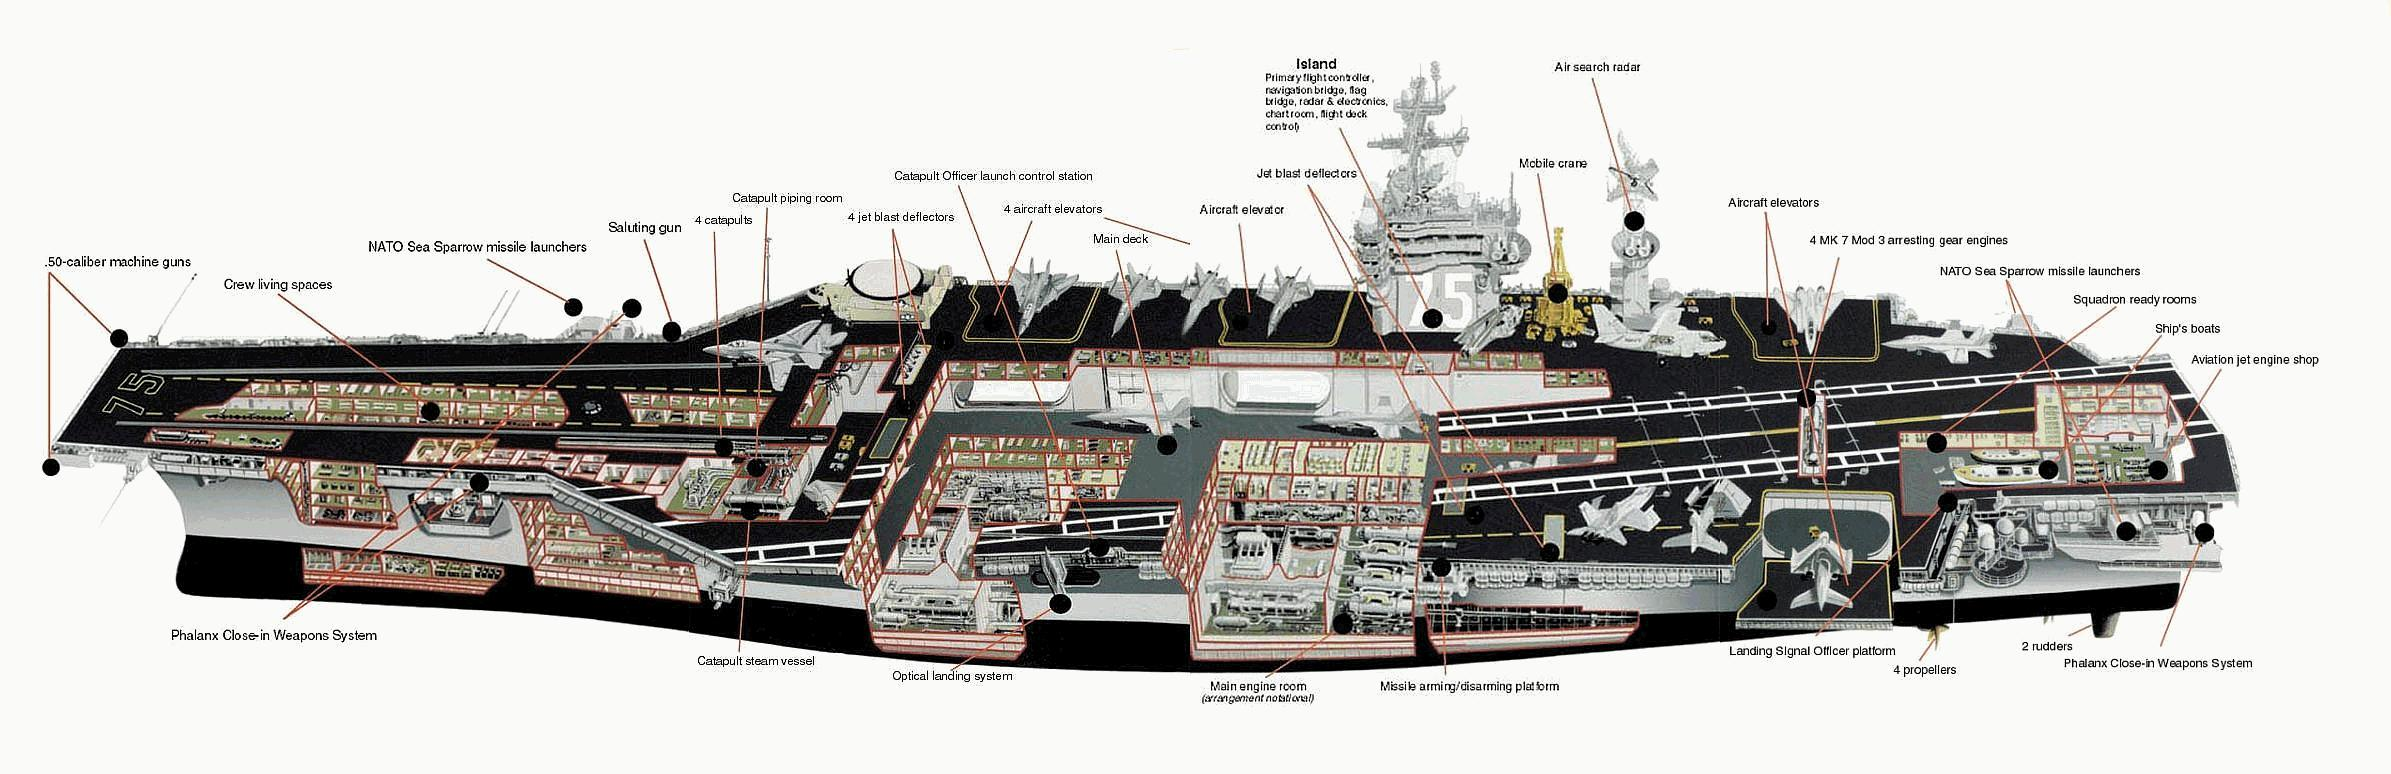 USS Nimitz-Aircraft Carrier